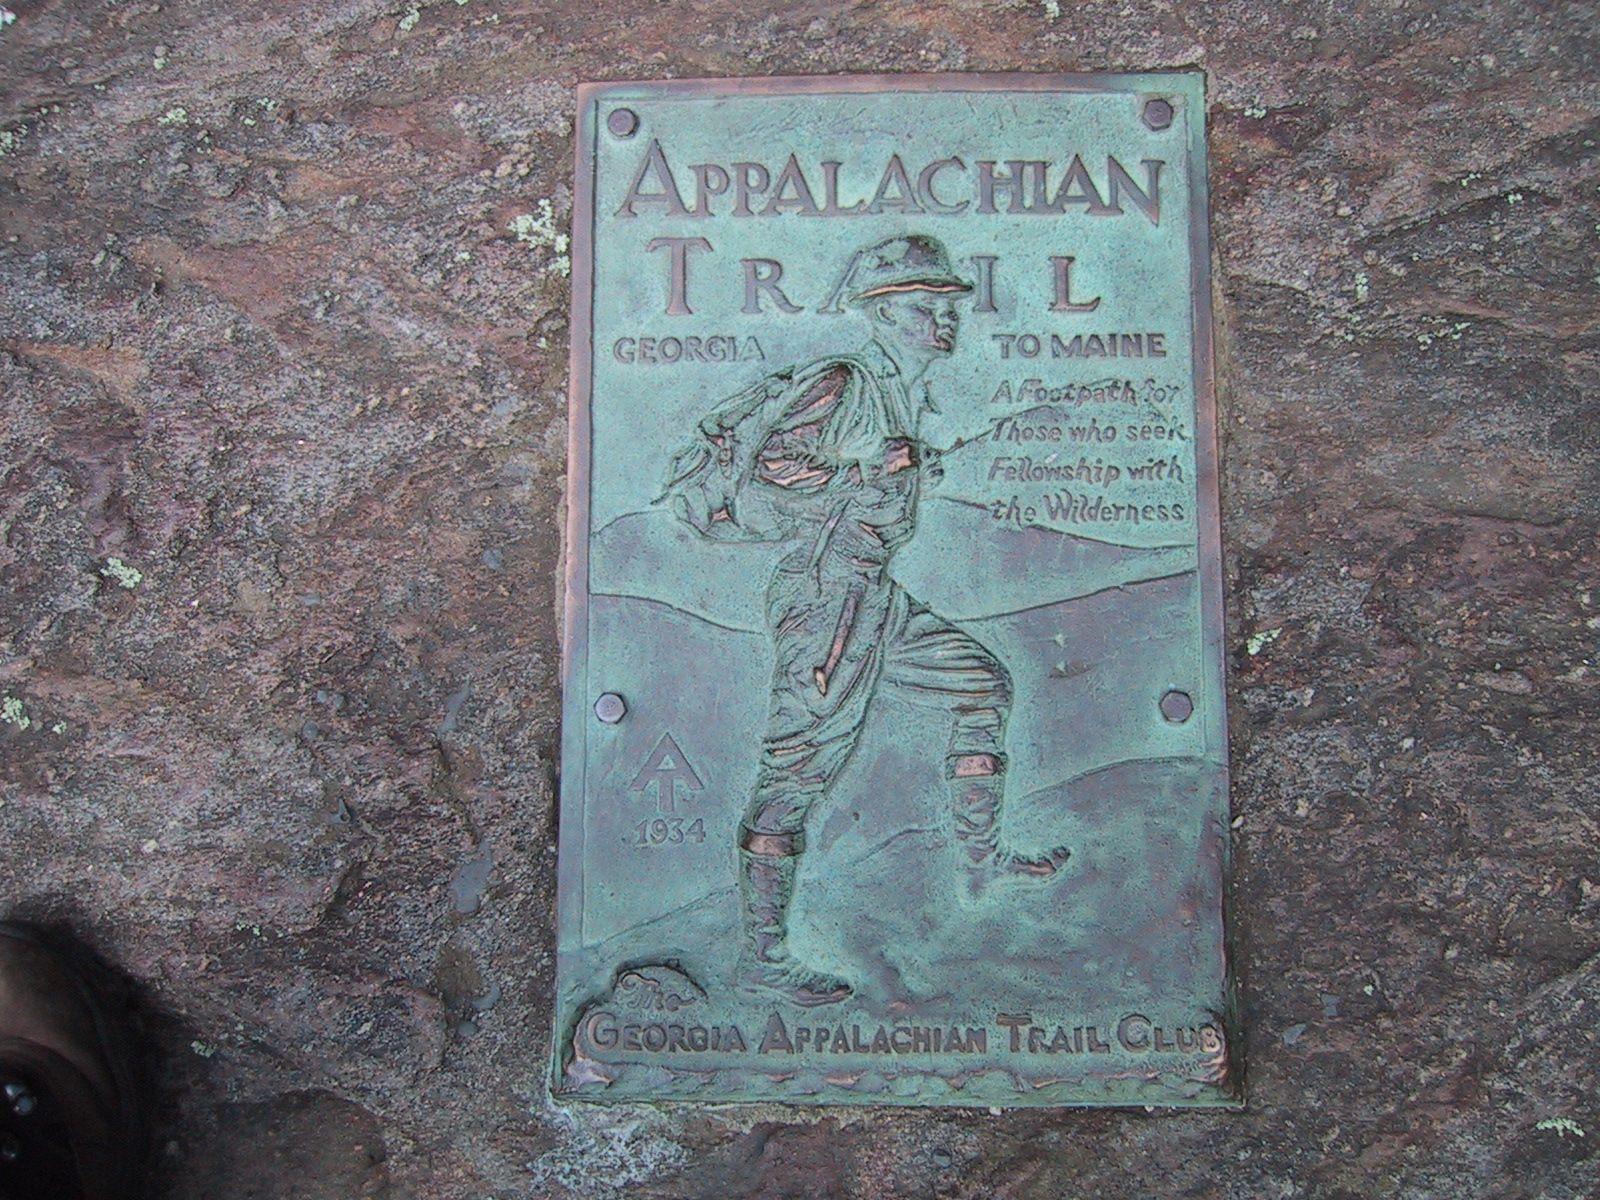 Appalachian Trail Thru-Hike